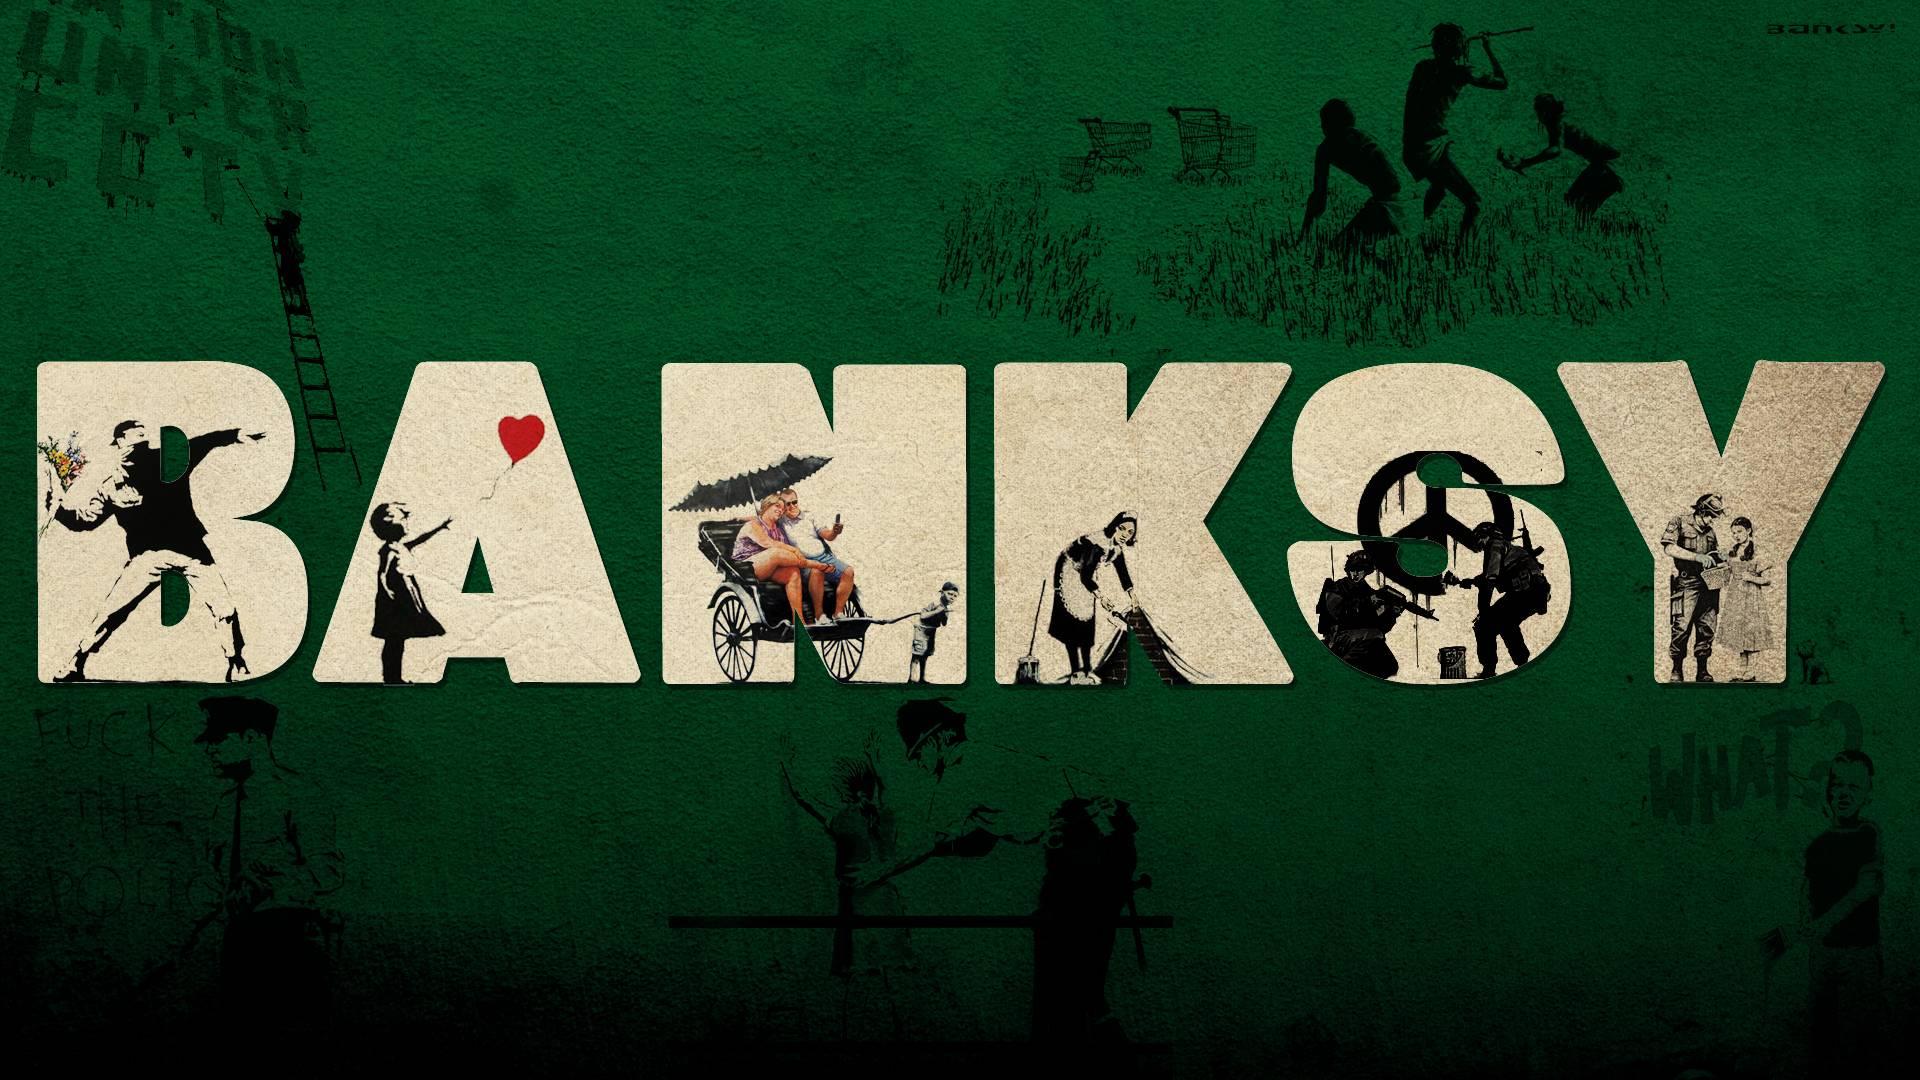 33 best images about <b>Banksy</b> Graffiti on Pinterest | Behance ...